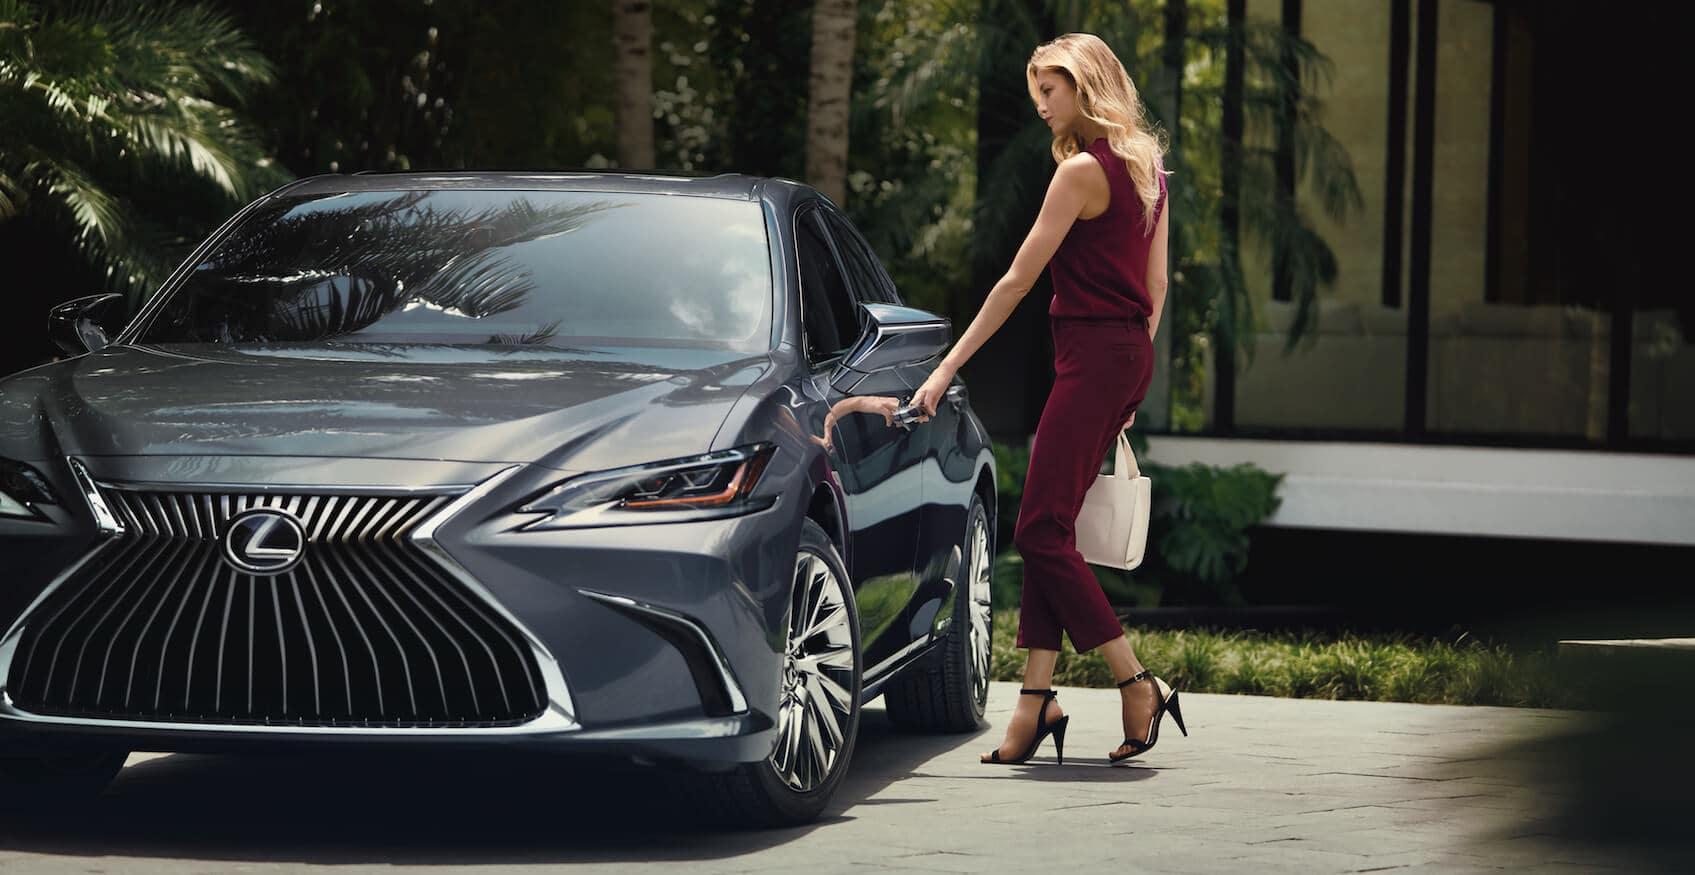 Used luxury Lexus ES for sale near Larchmont, NY